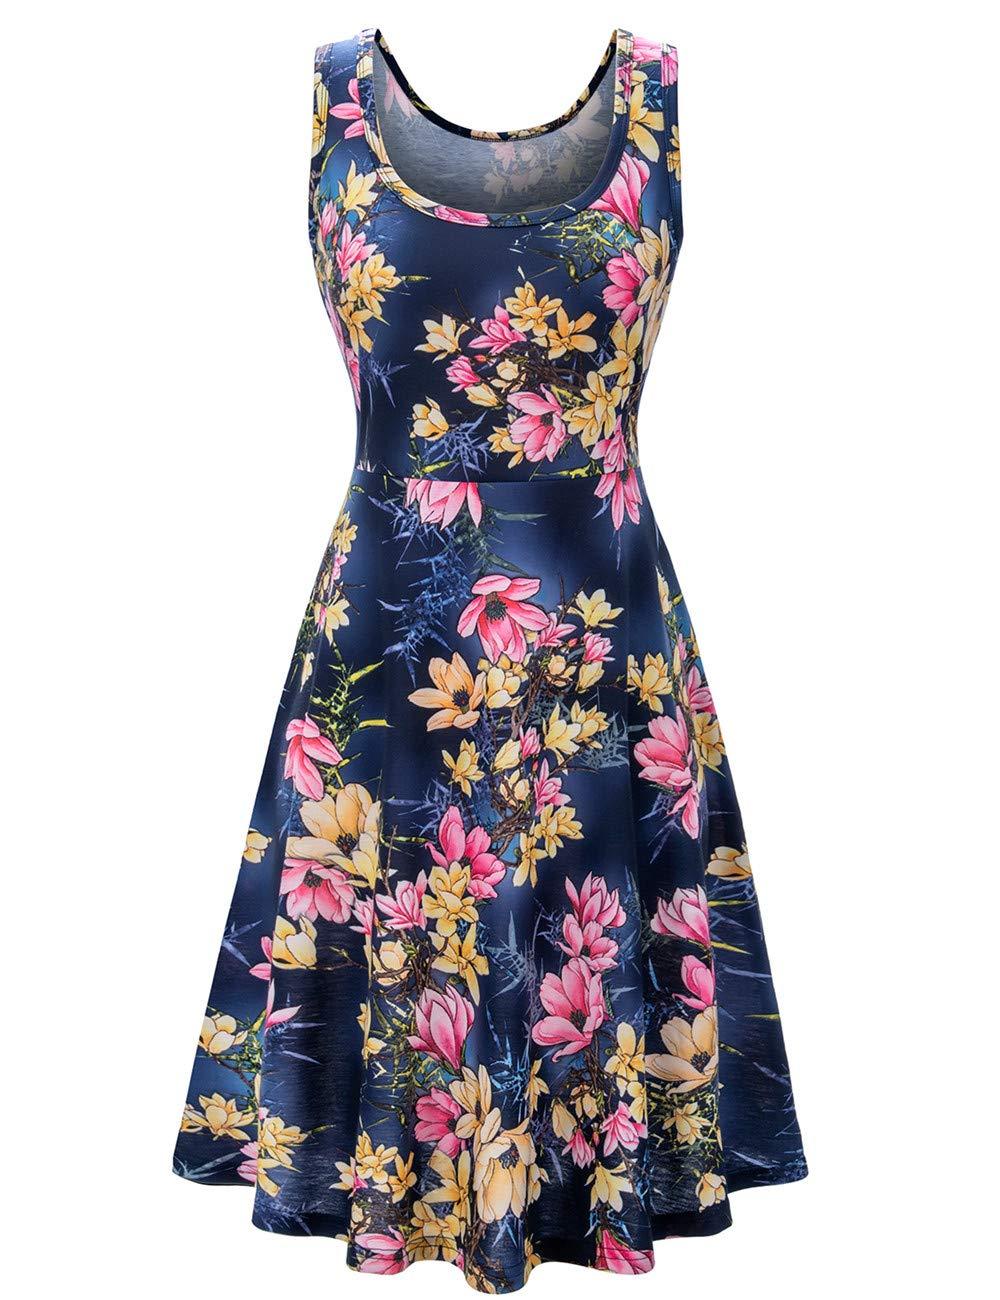 Herou Casual Floral Summer Sleeveless Dress for Women